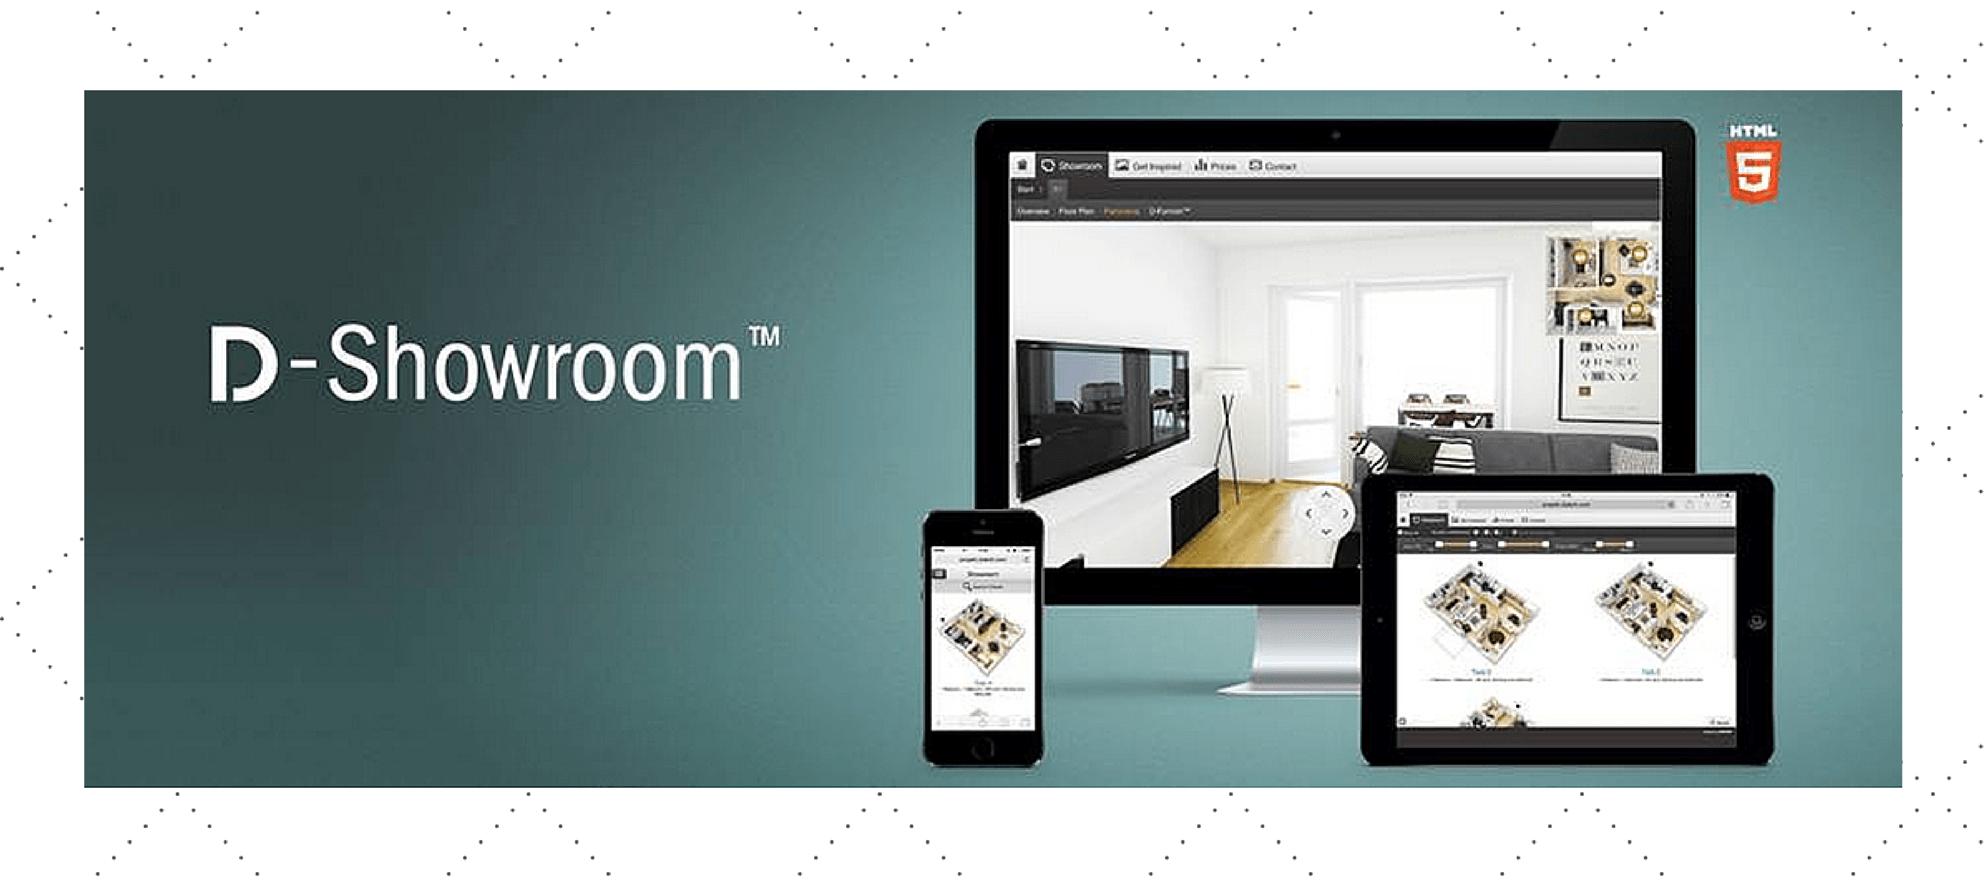 Portals can sell 3-D listing enhancements using new platform